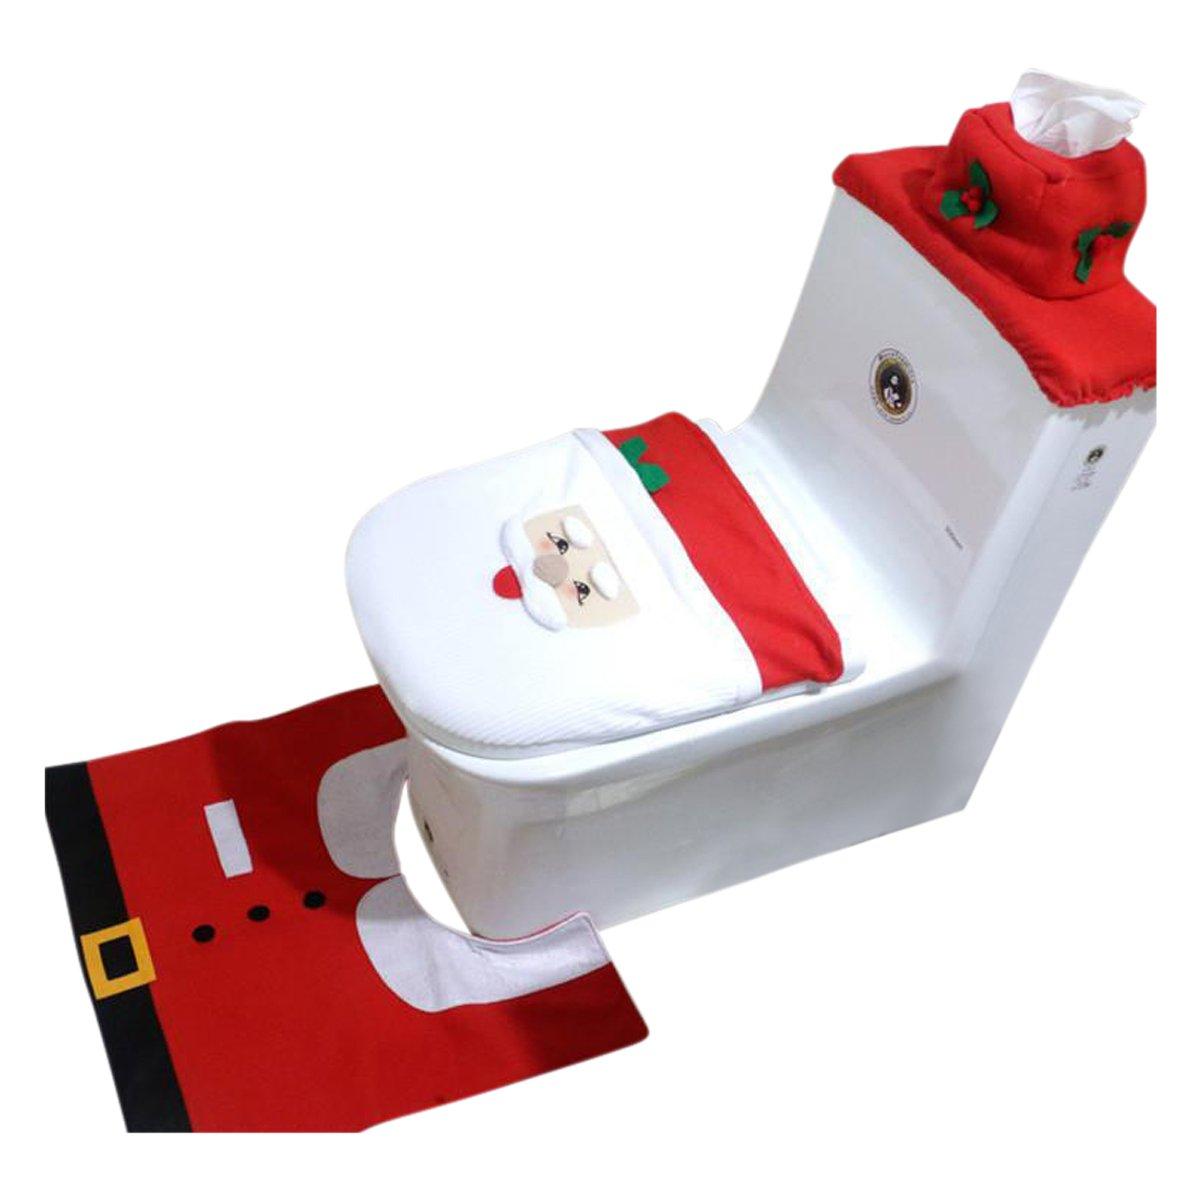 Christmas Holiday Festive Toilet Seat Cover & Rug 3 Piece Set Three Decorative Styles to Choose From Santa Elf Santa Claus (Santa)